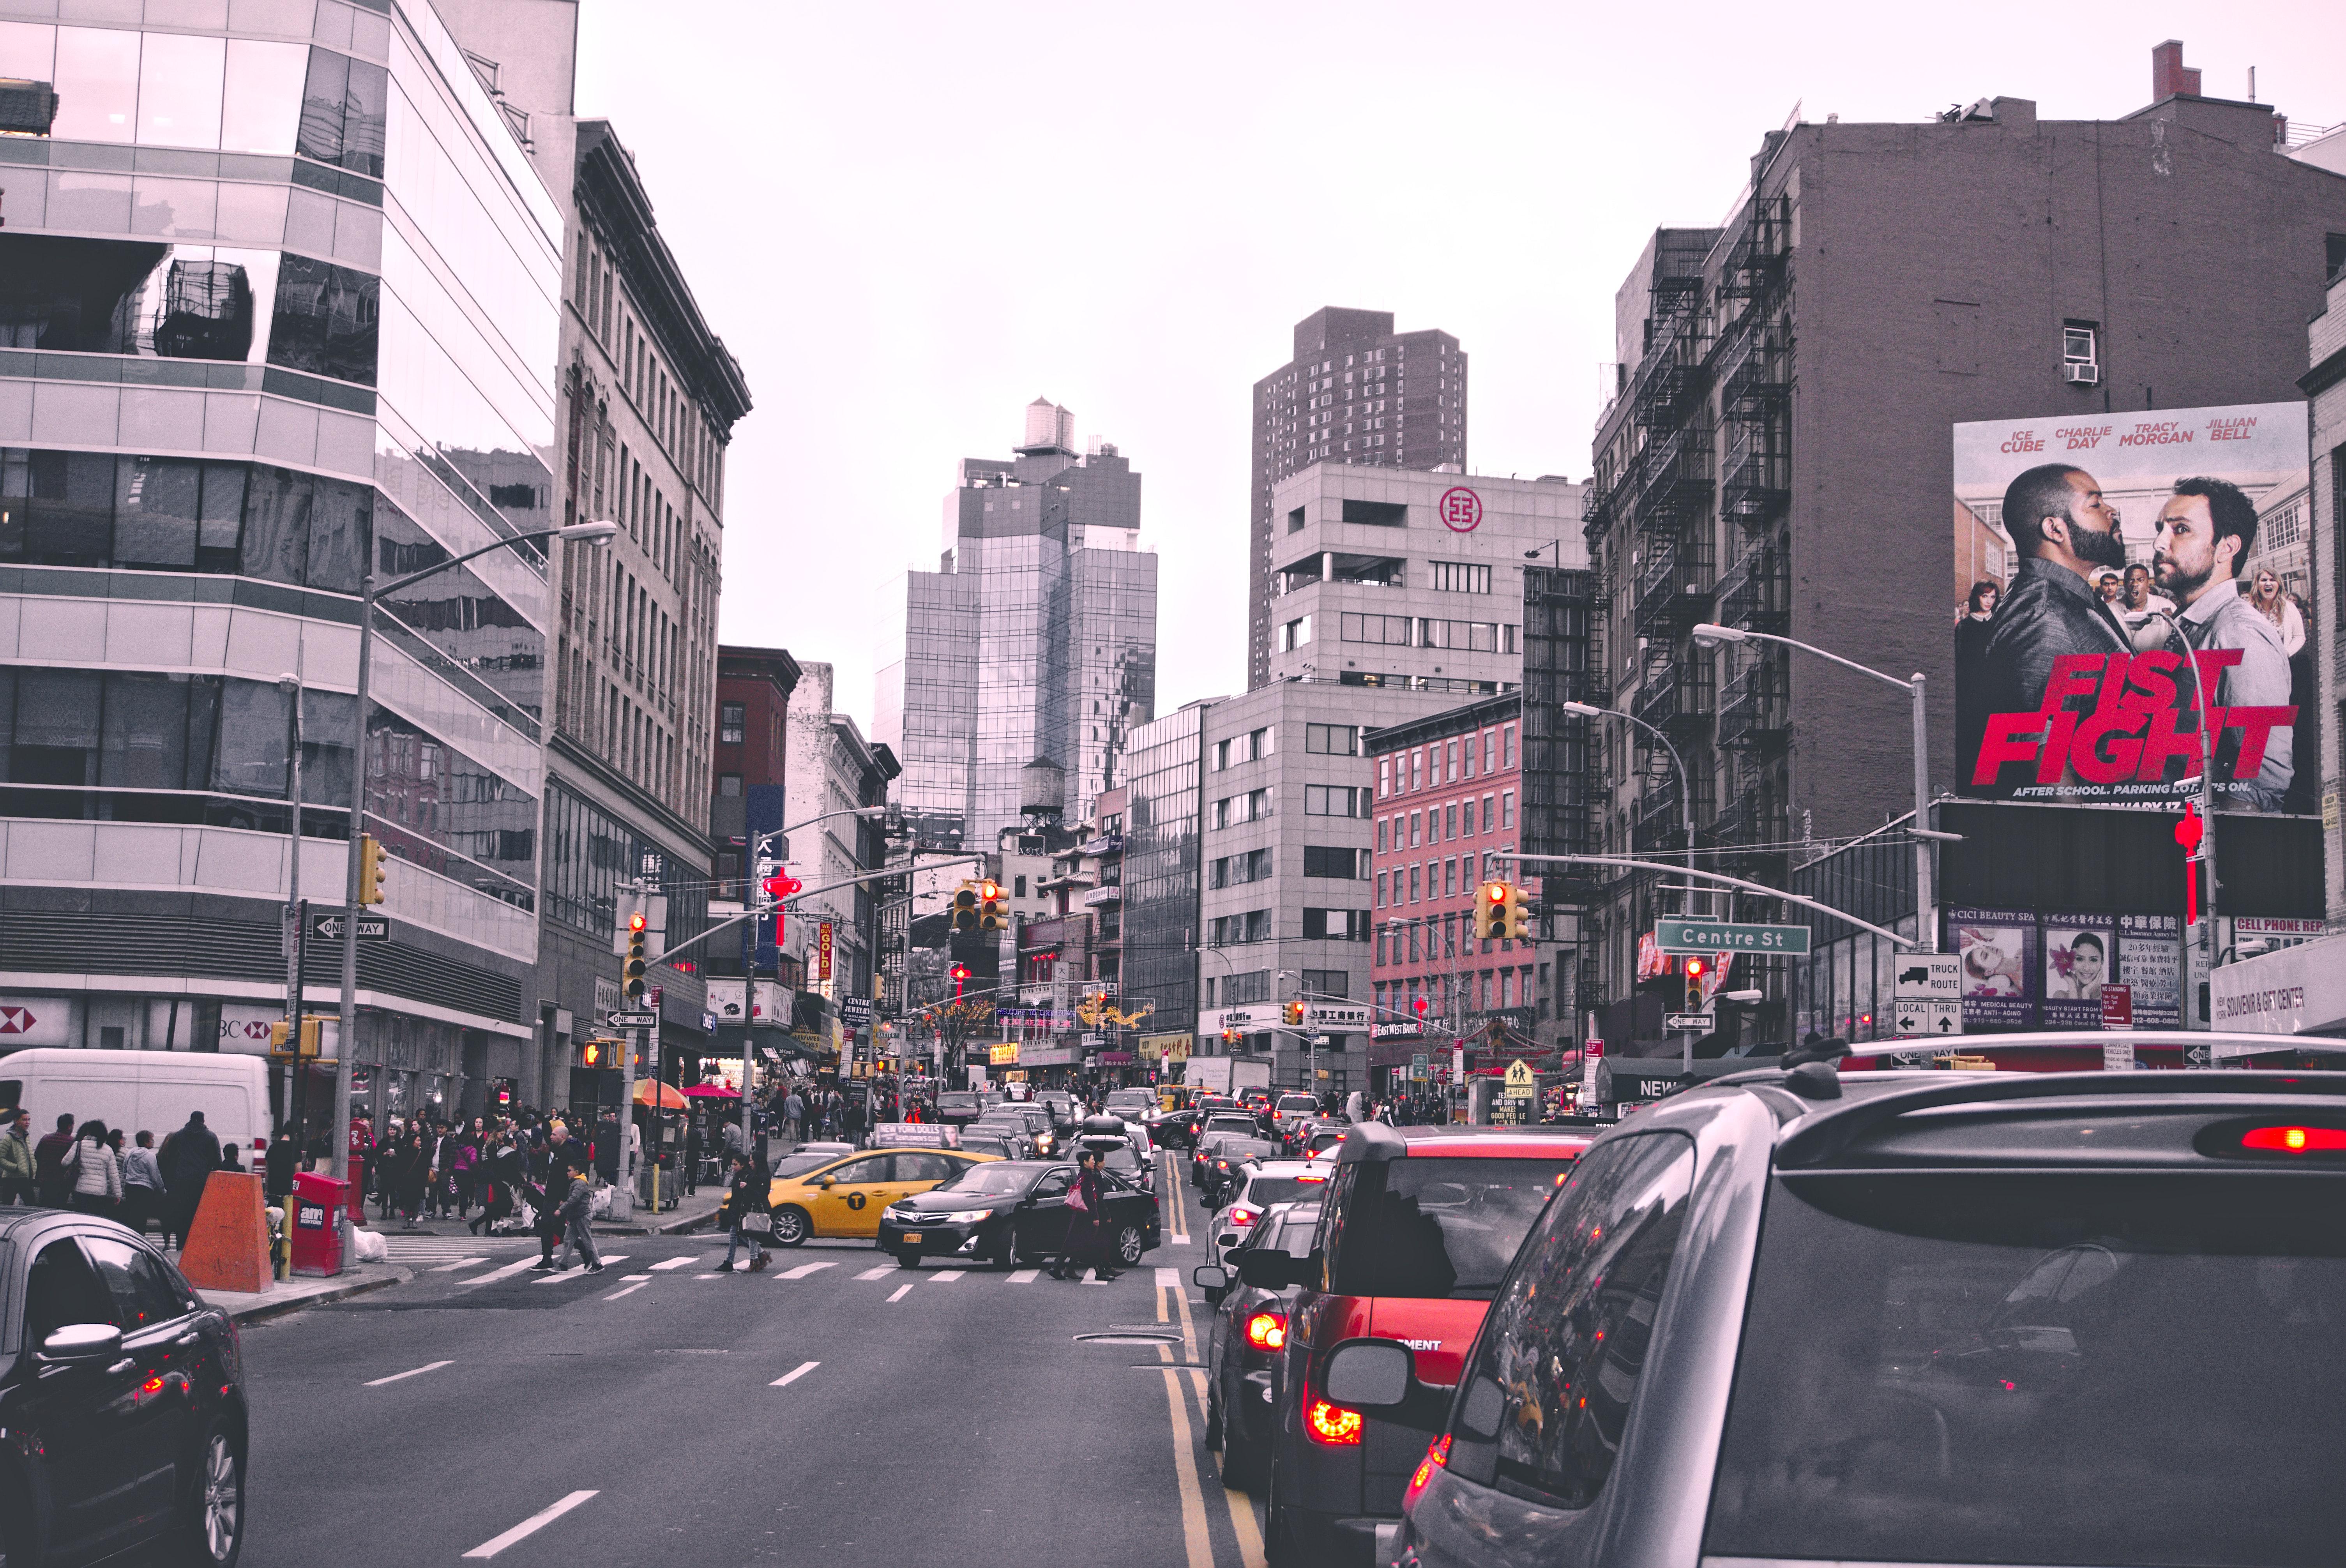 Traffic on city street photo